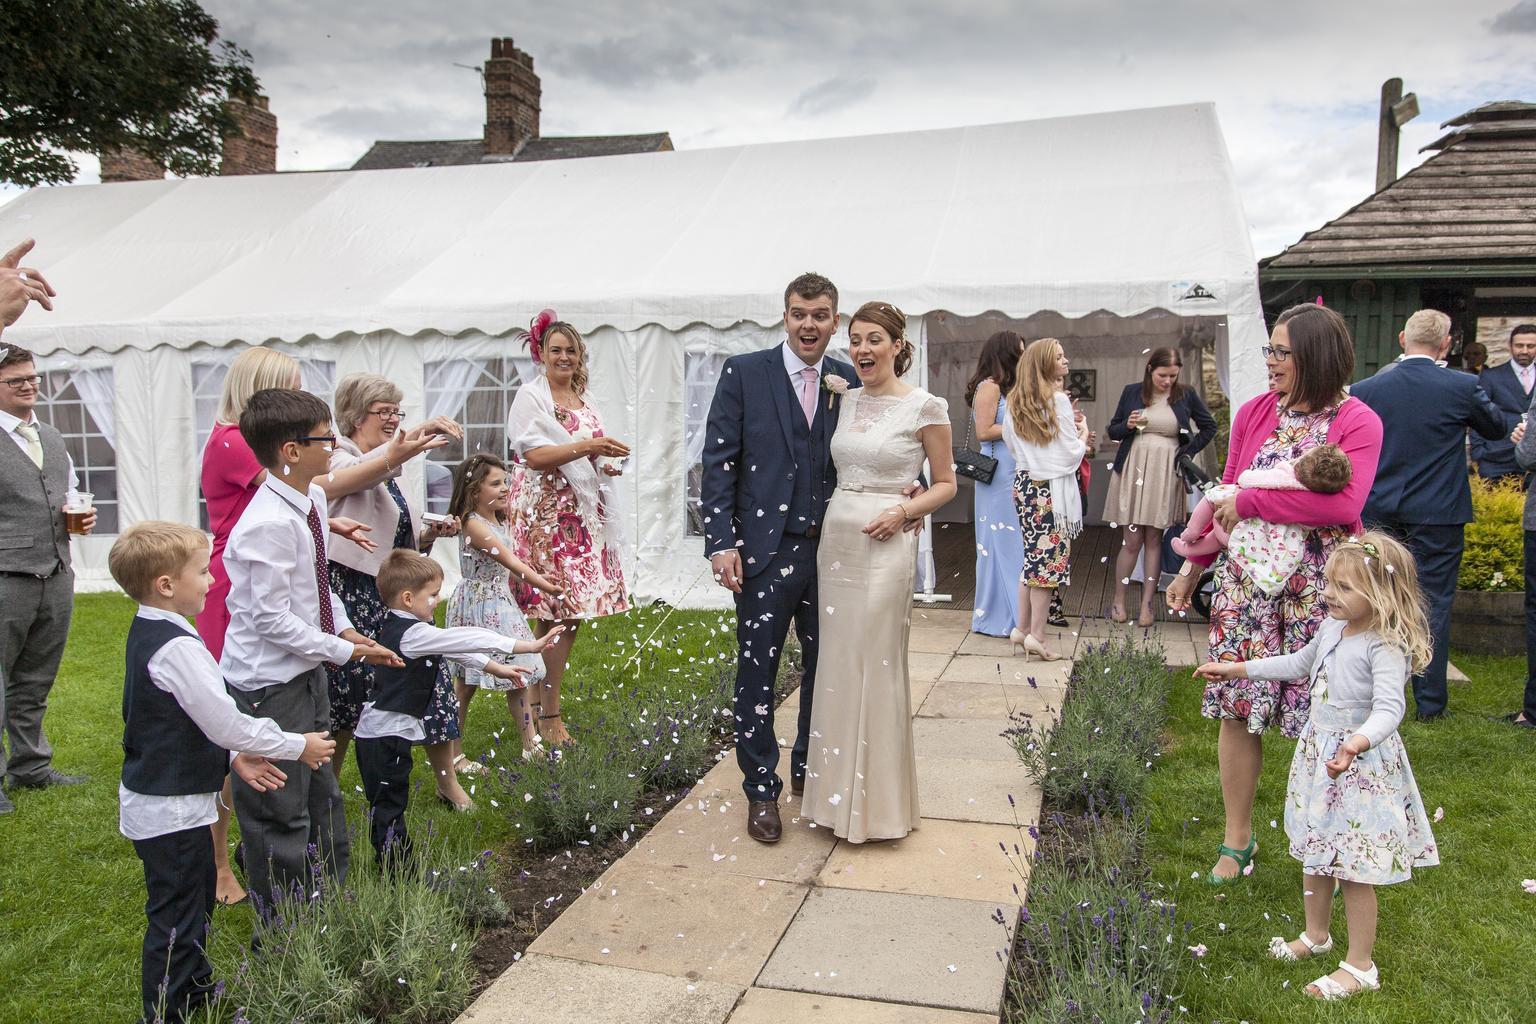 svadba, oslavy